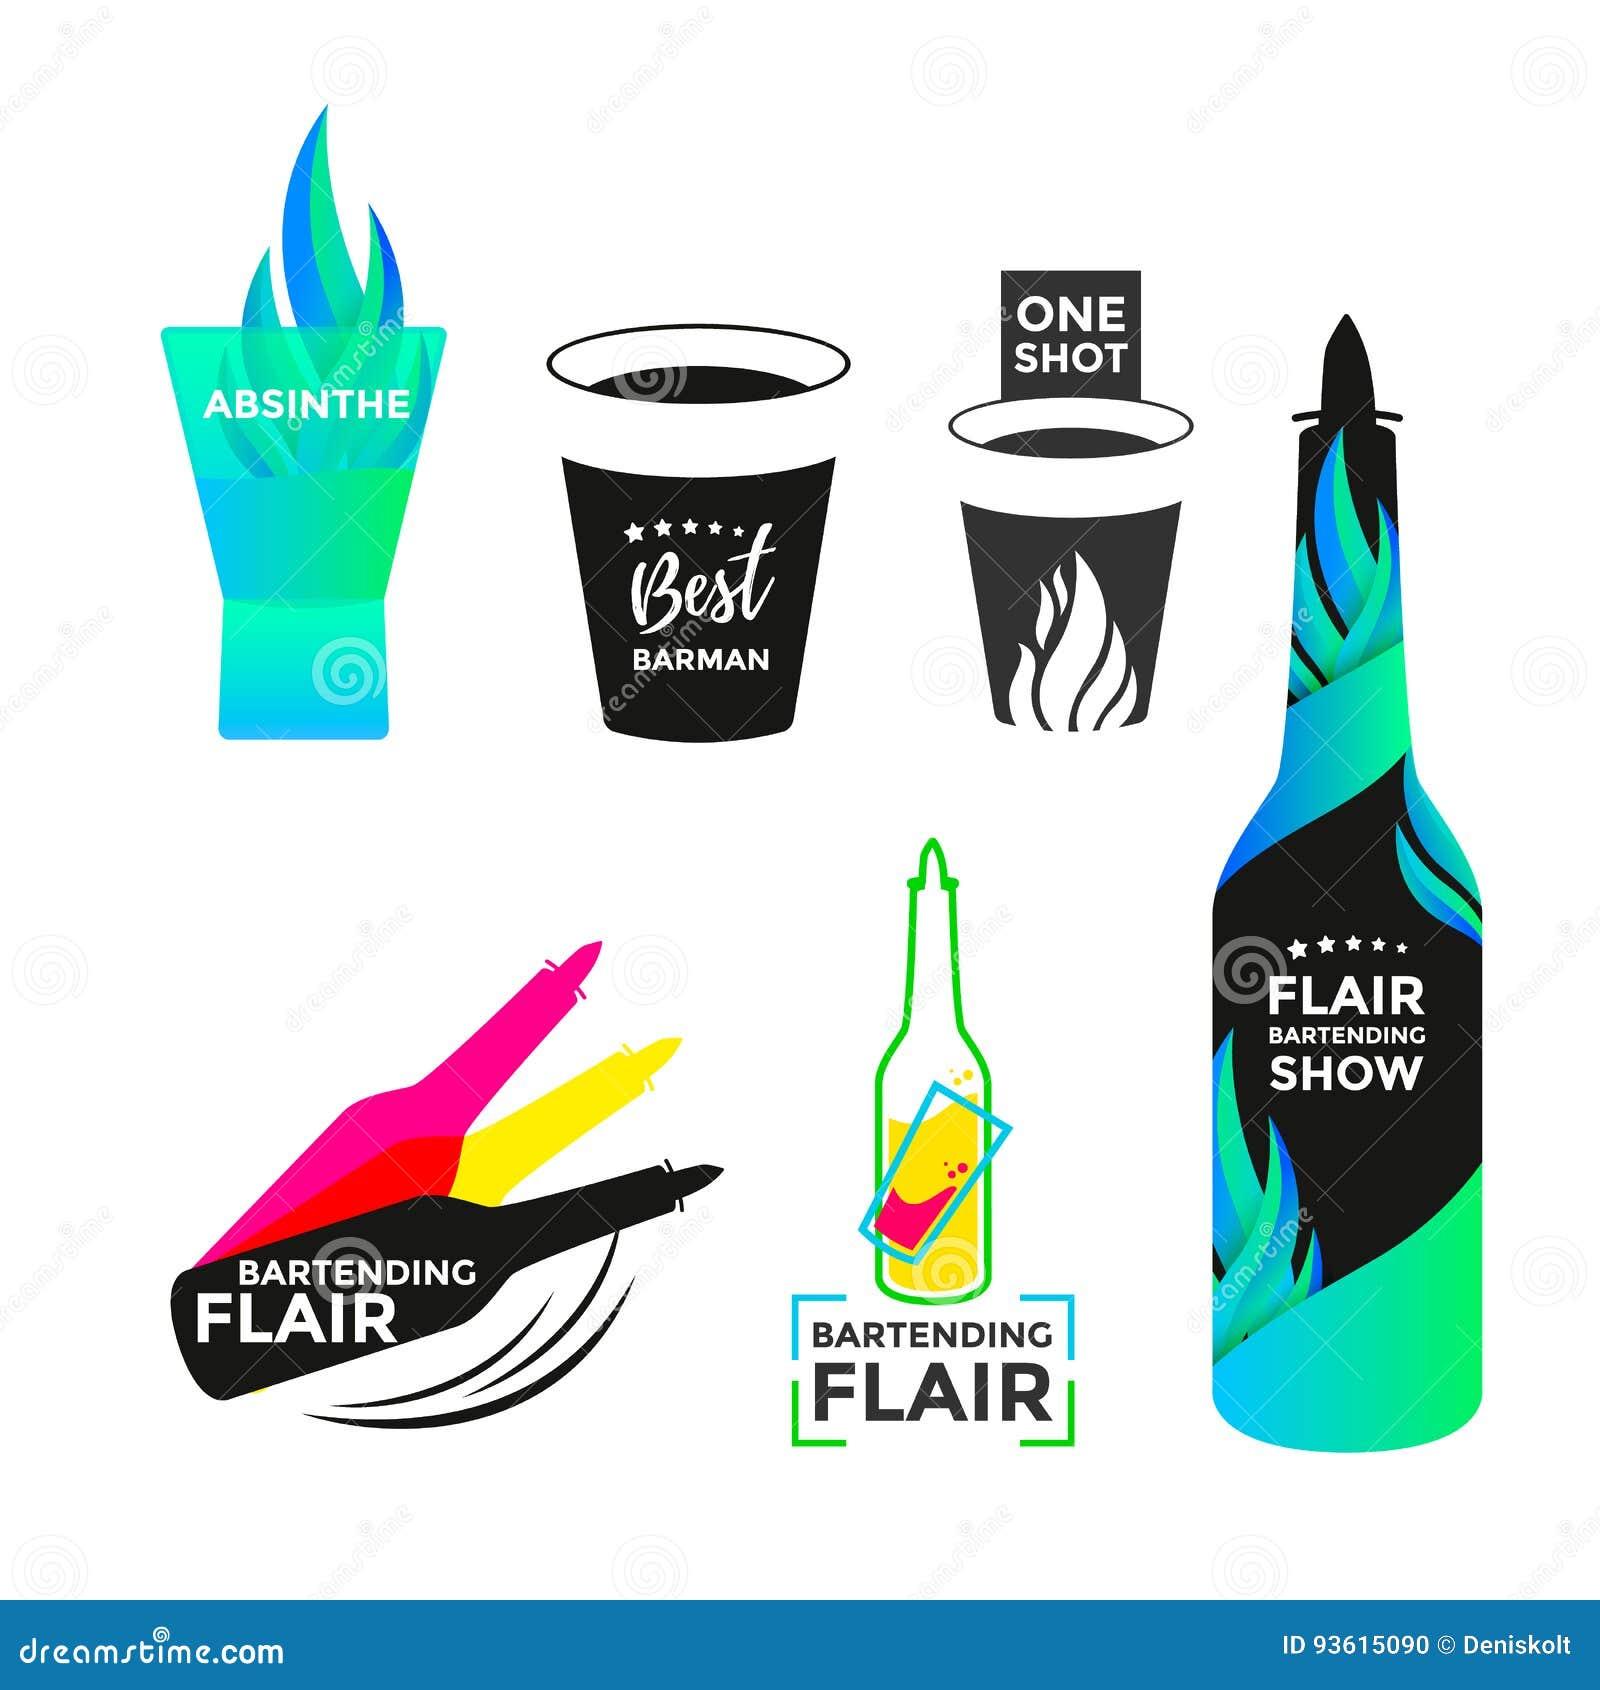 Talent bartending pictogram